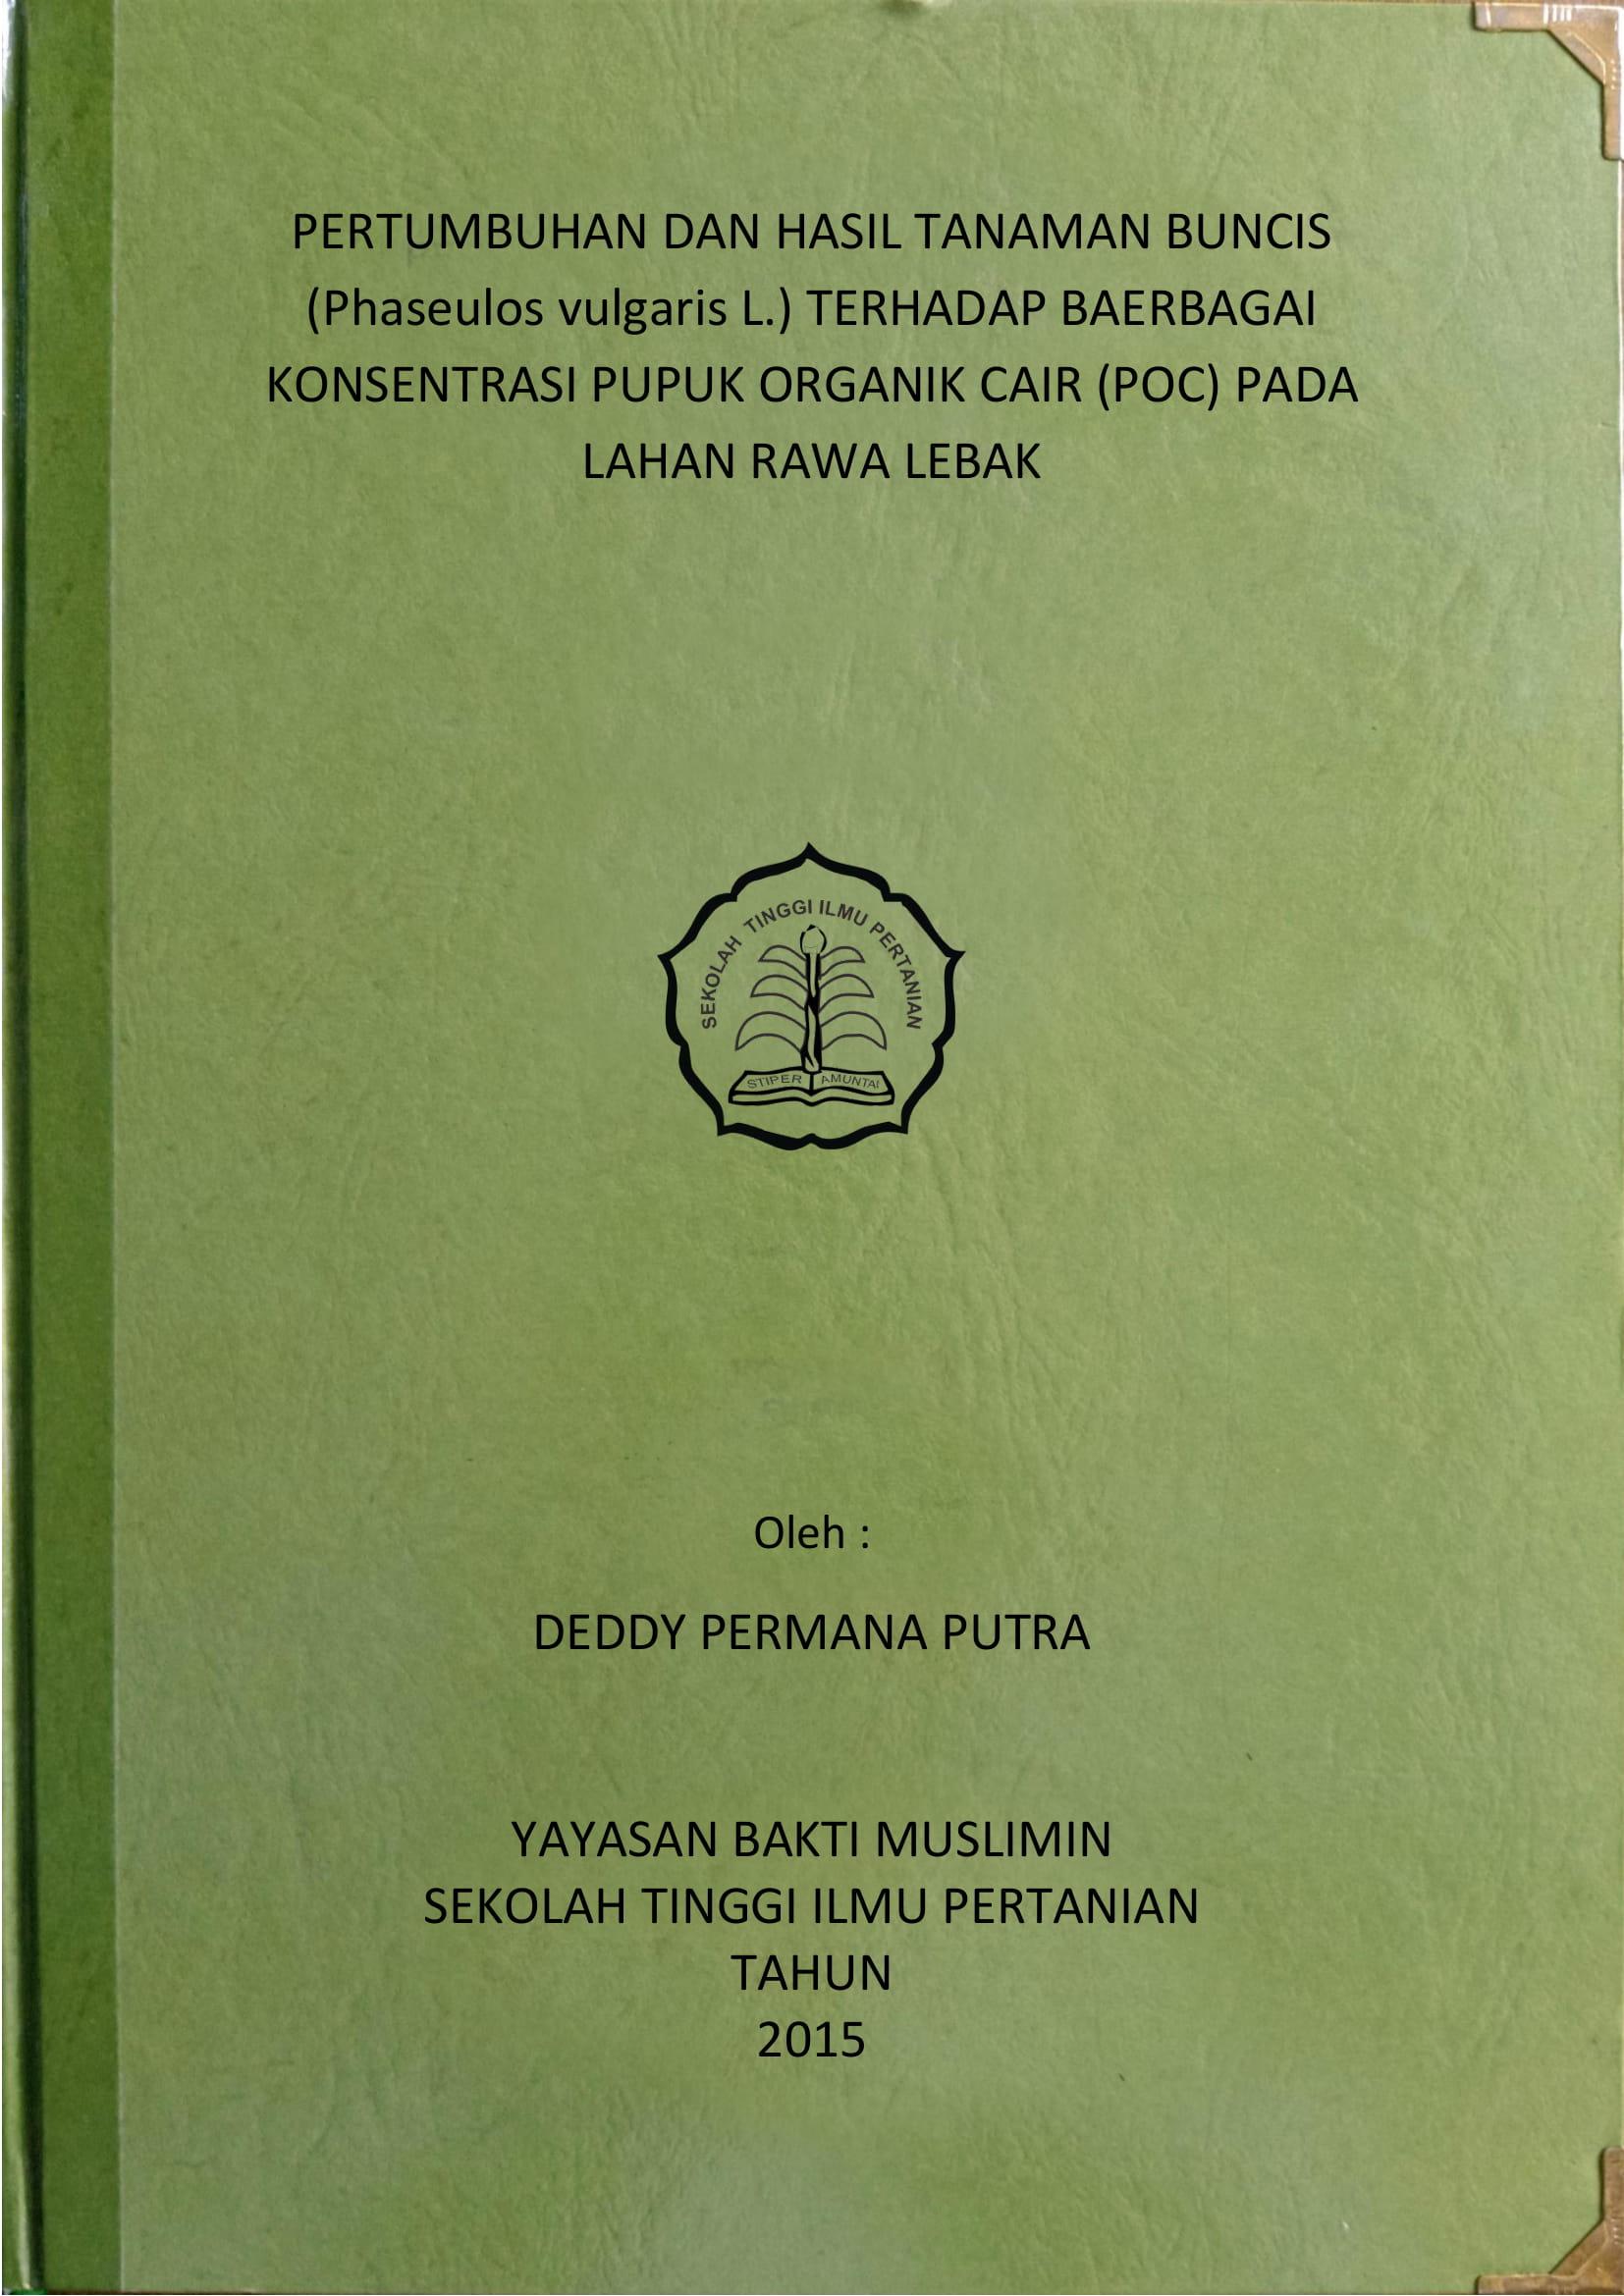 THP-1